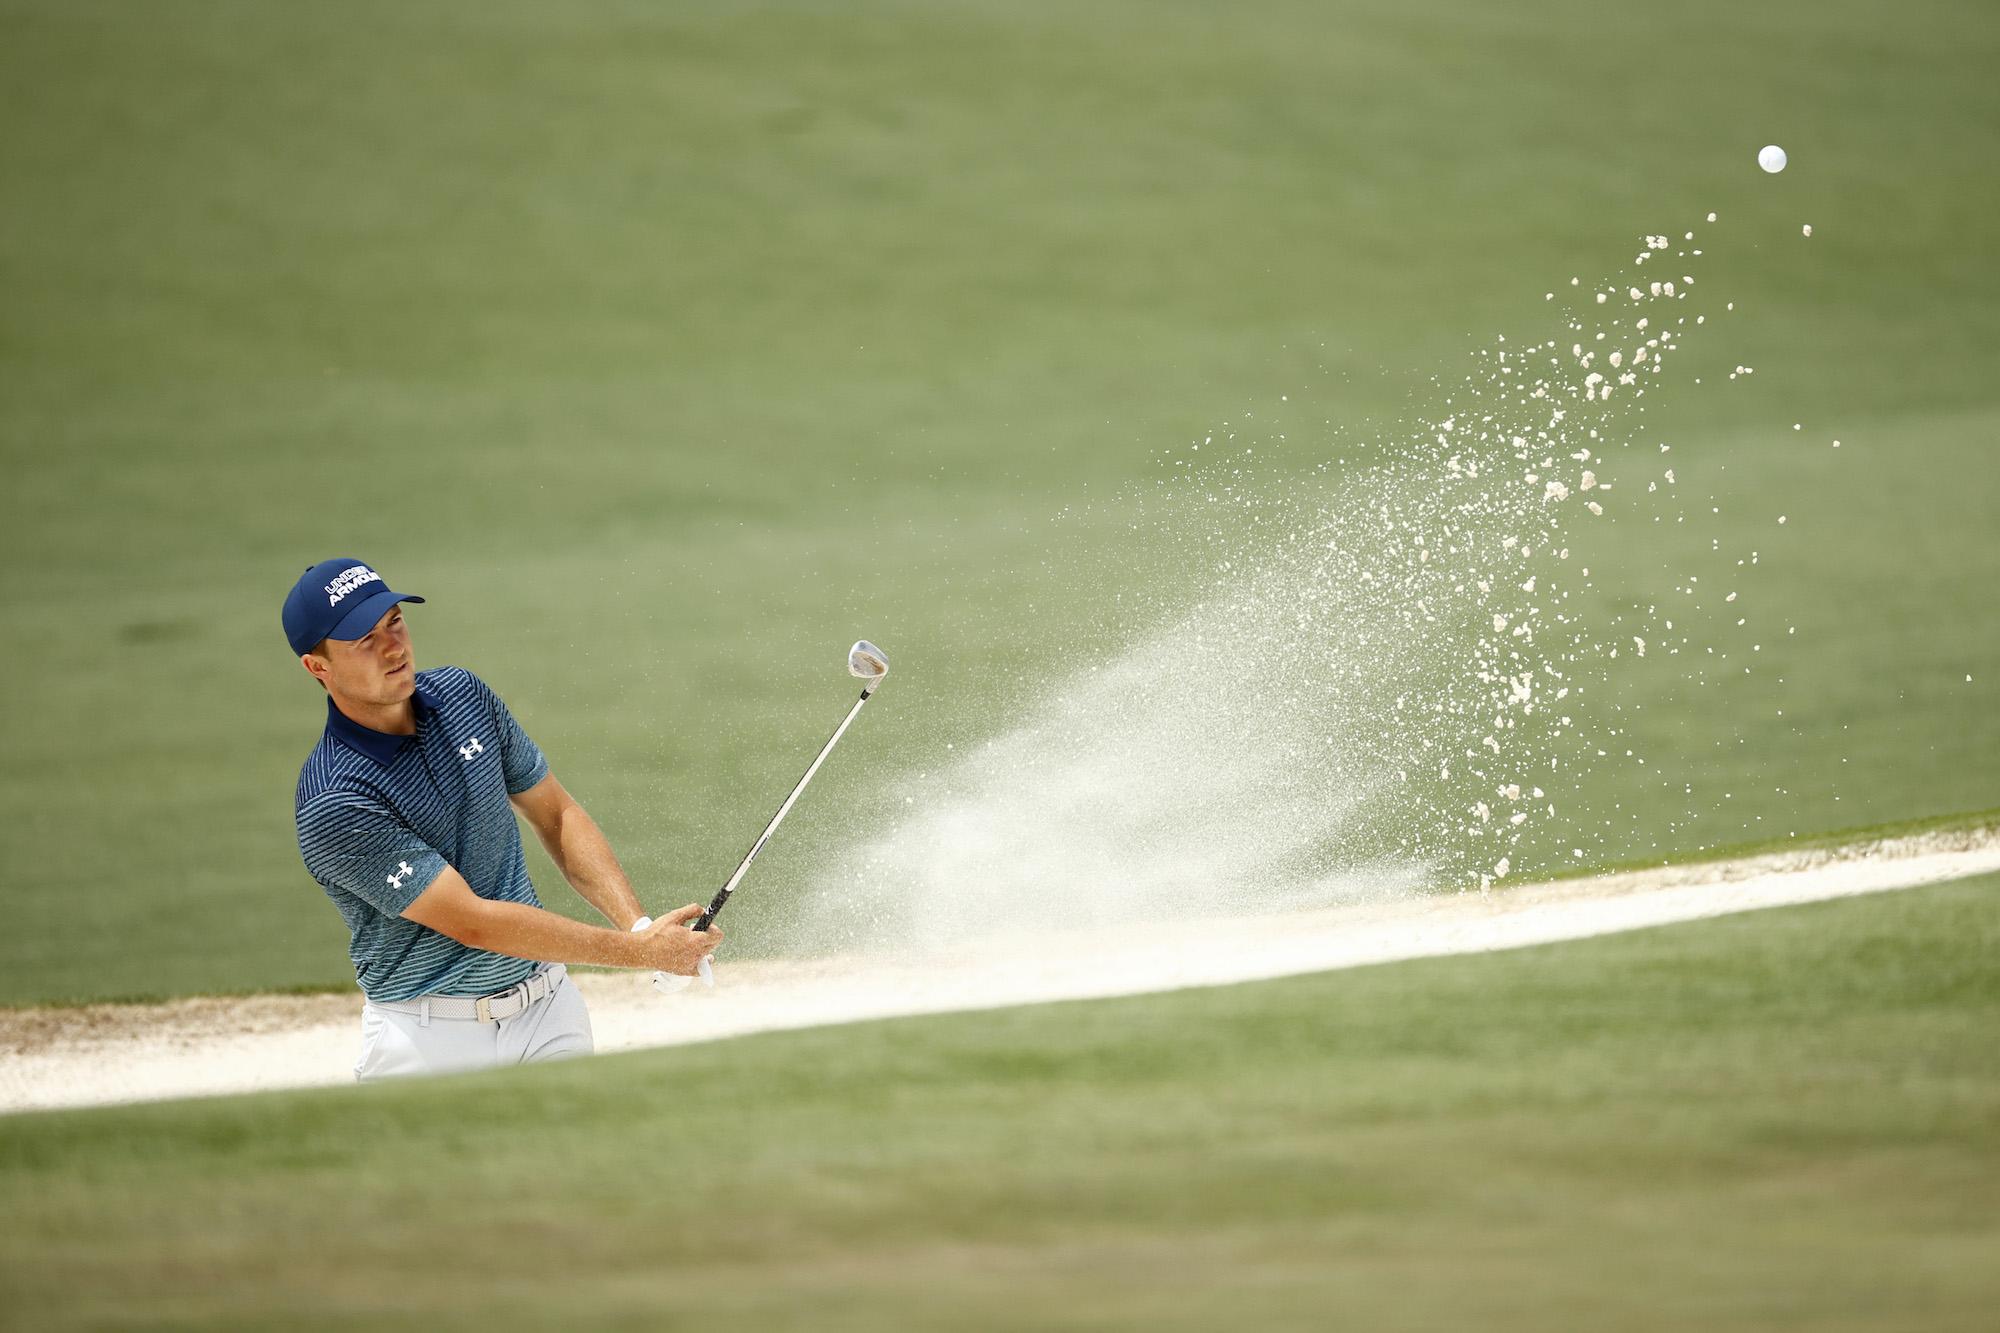 2021 Masters Tournament: Round 1 - Bunker Shot on No. 2